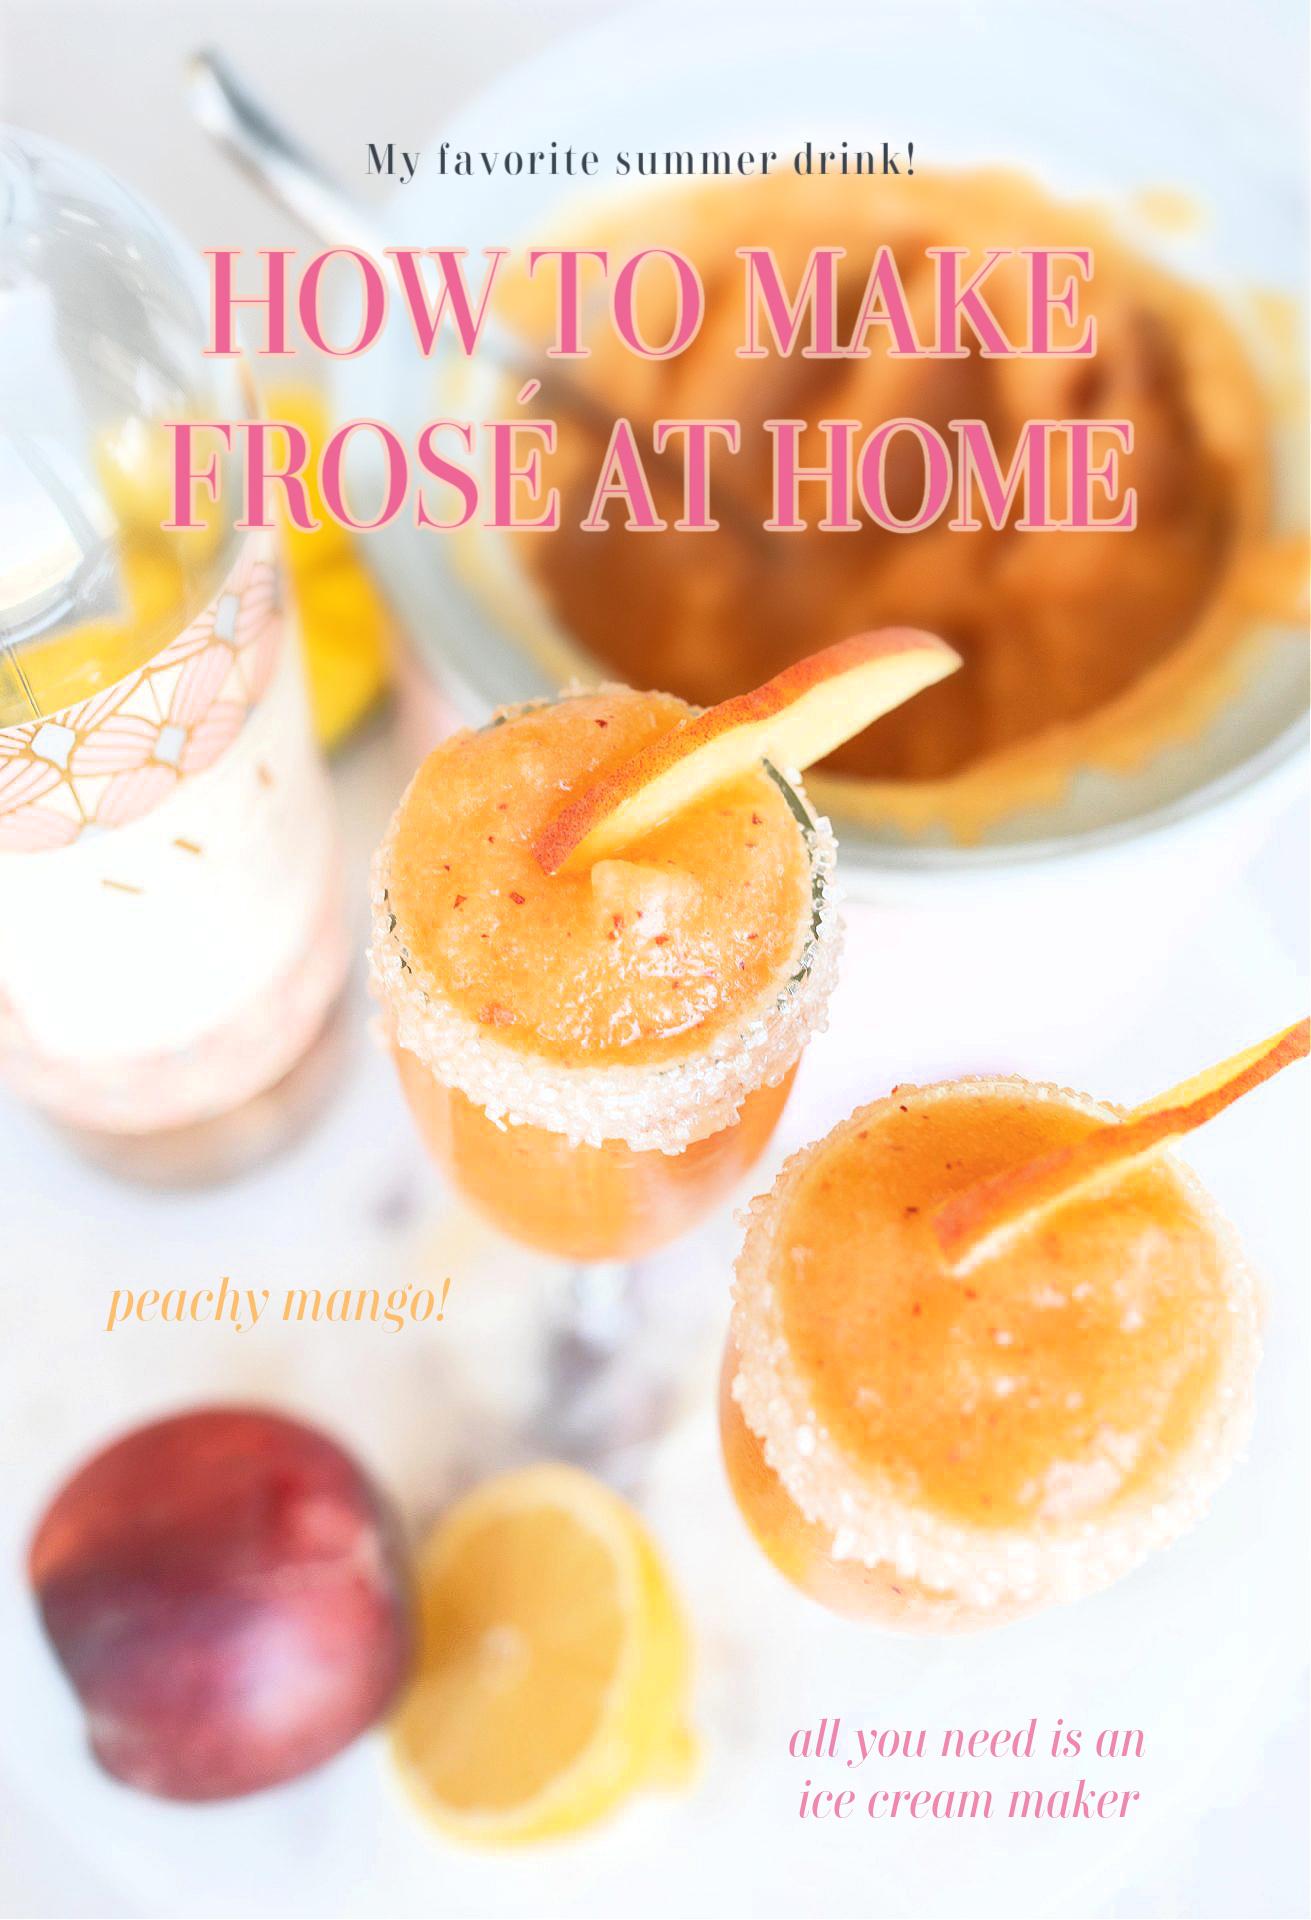 frose, rose, peaches, lemon, mango, frozen rose, frozen drinks, Ava grace, summer, spring, refreshing, party drinks, at home frose, frozen alcoholic beverage, ice cream maker